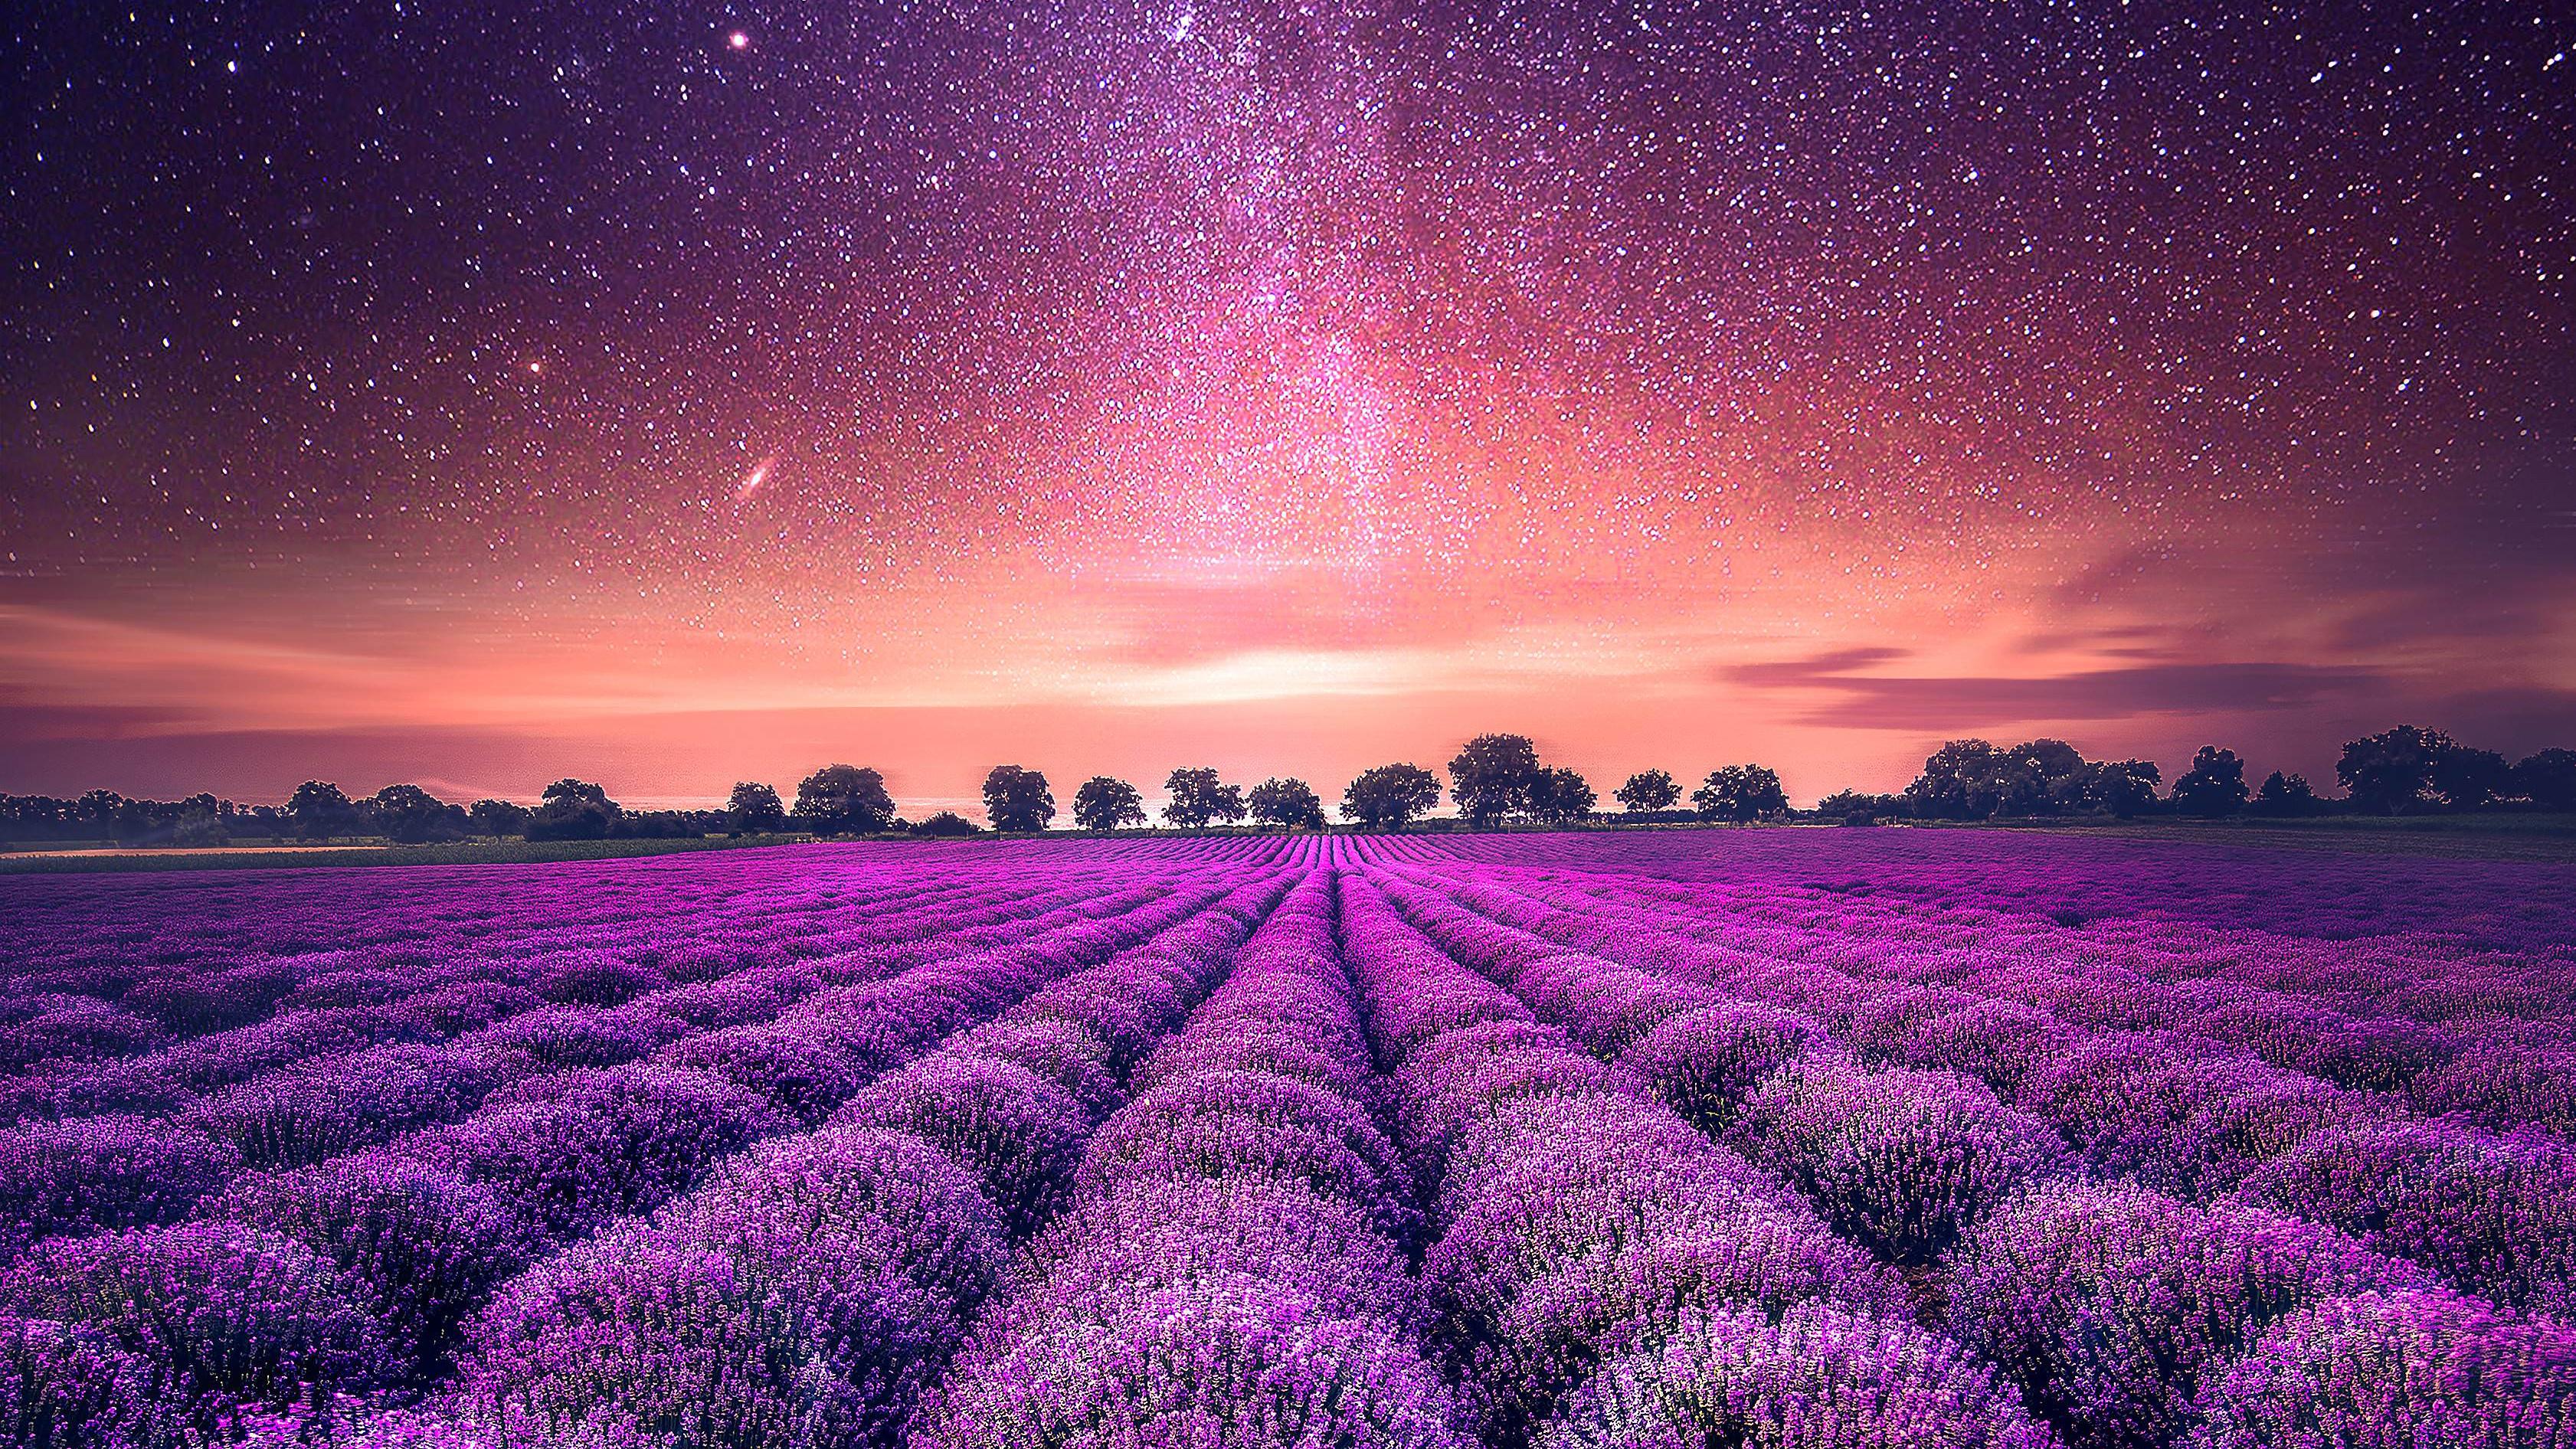 Starry Sky Lavender field Wallpapers | HD Wallpapers